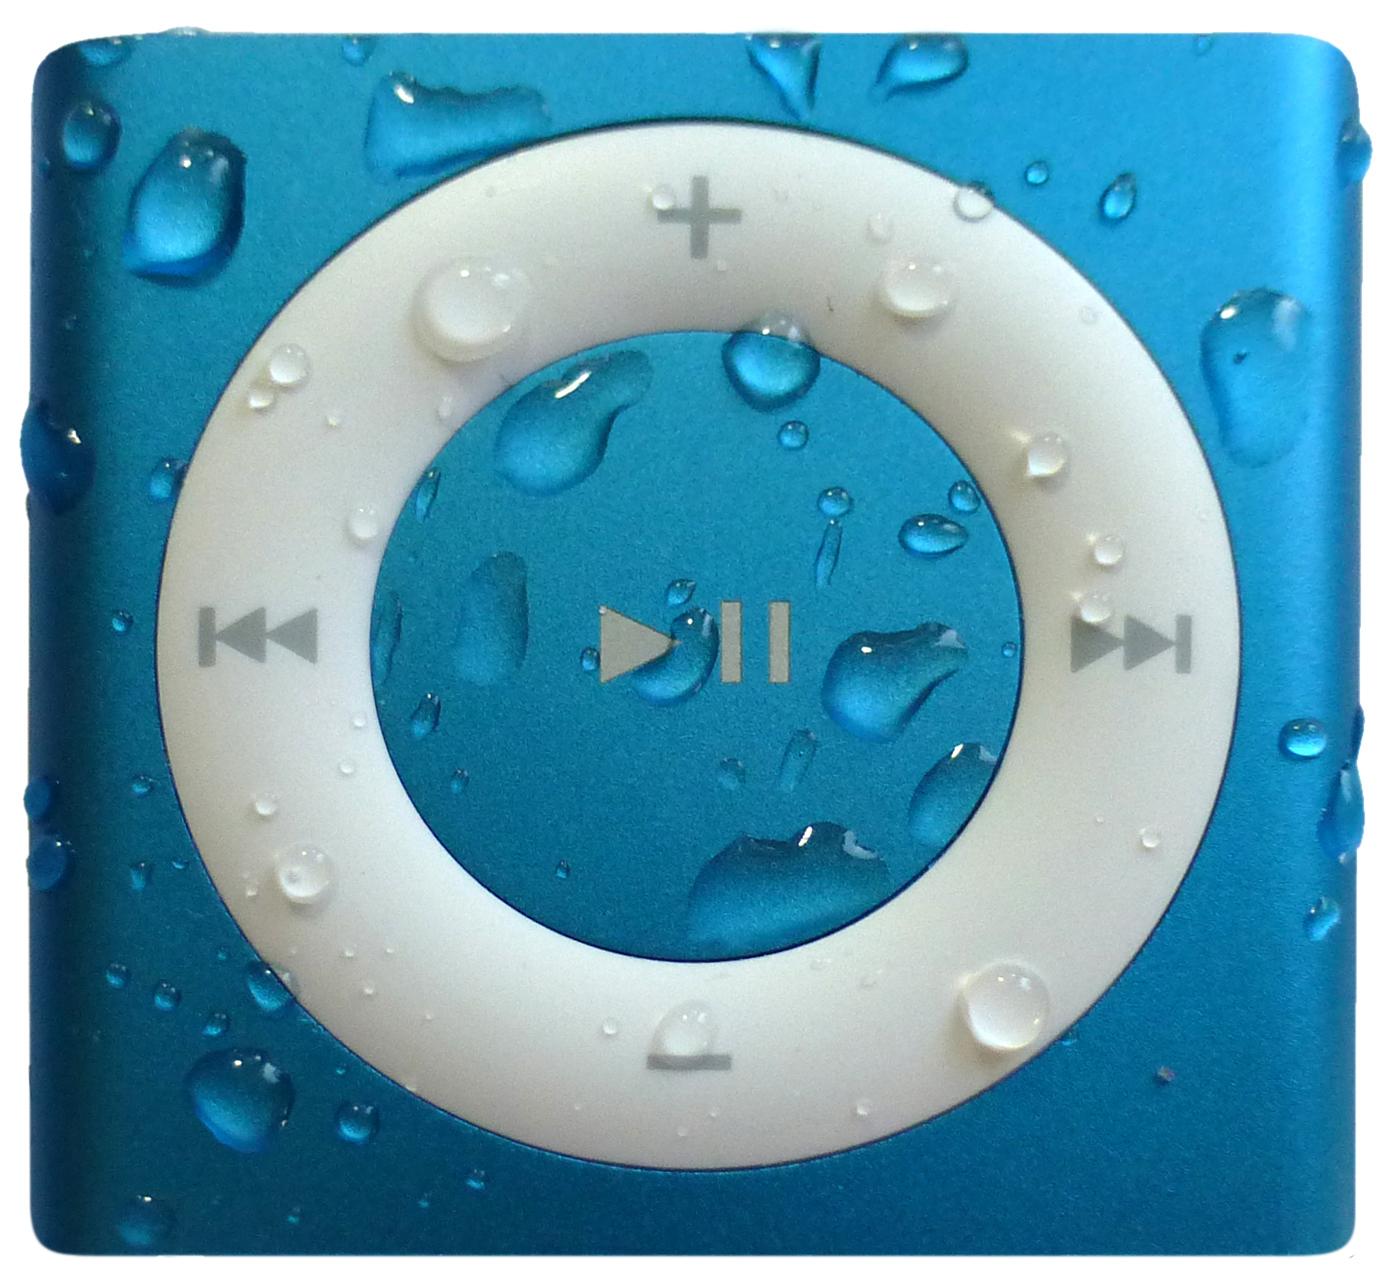 blue waterproof iPod shuffle